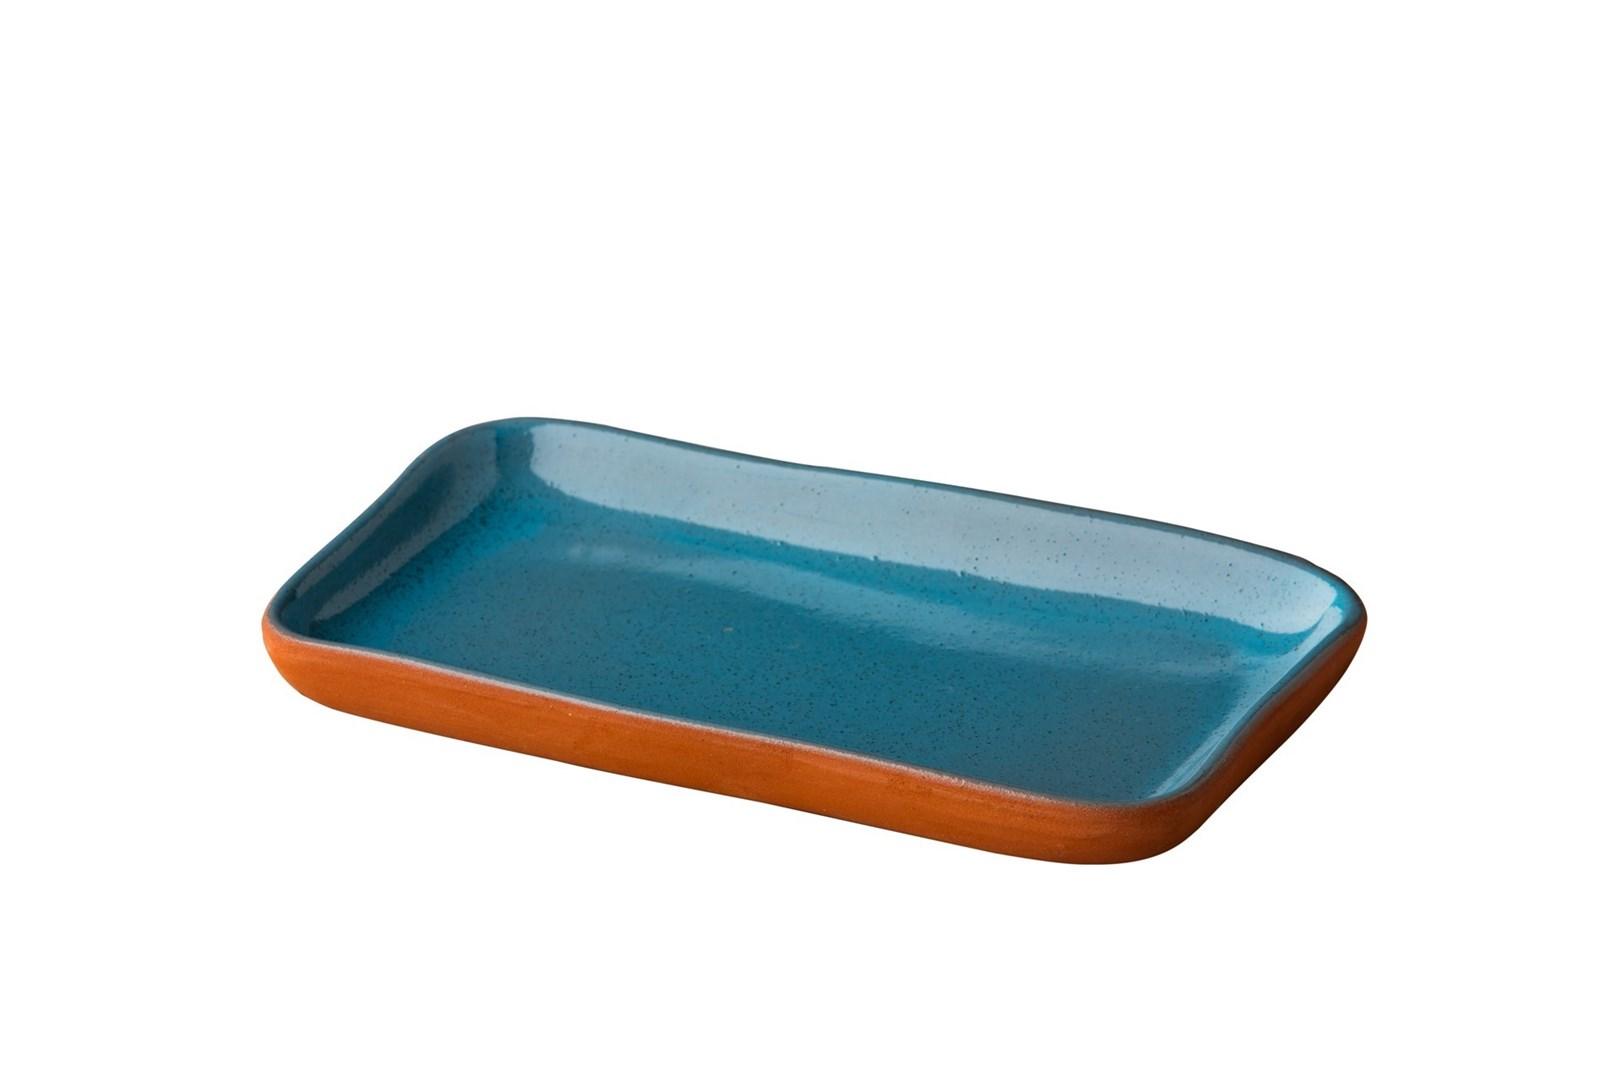 Productafbeelding Stoneheart snack tapas bord 19 x 11,2 cm blauw